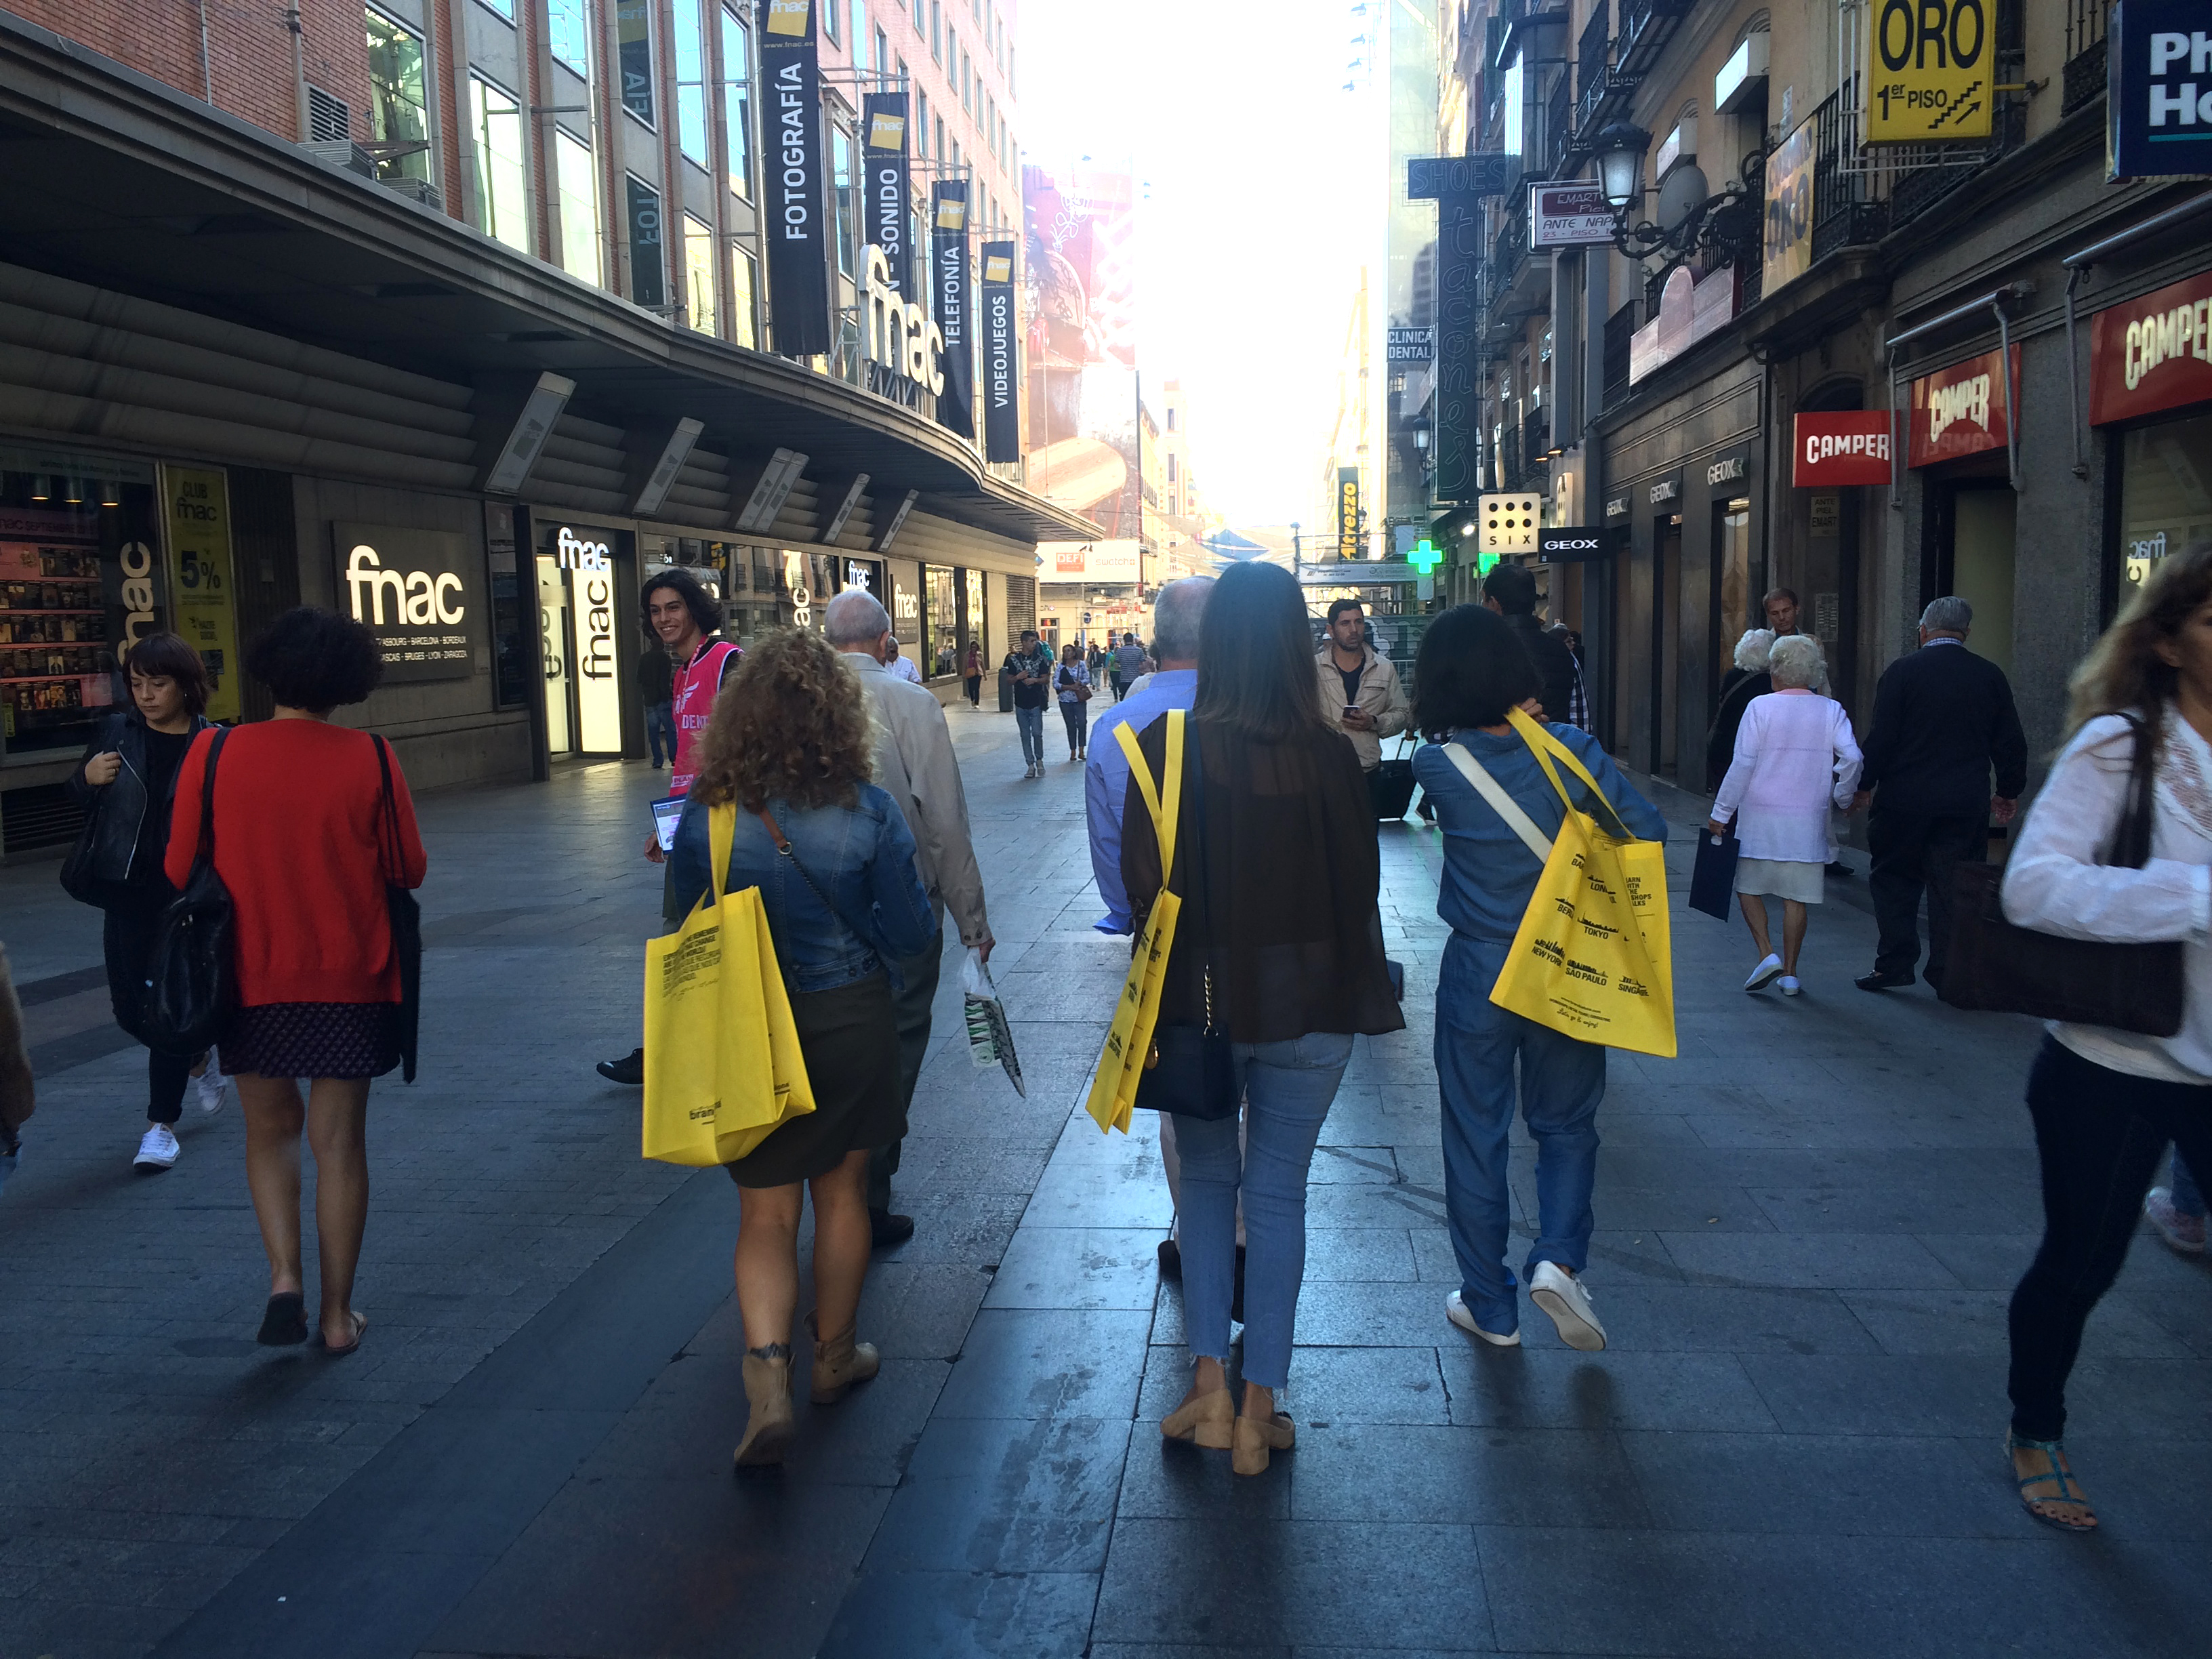 brandcelona retail tour